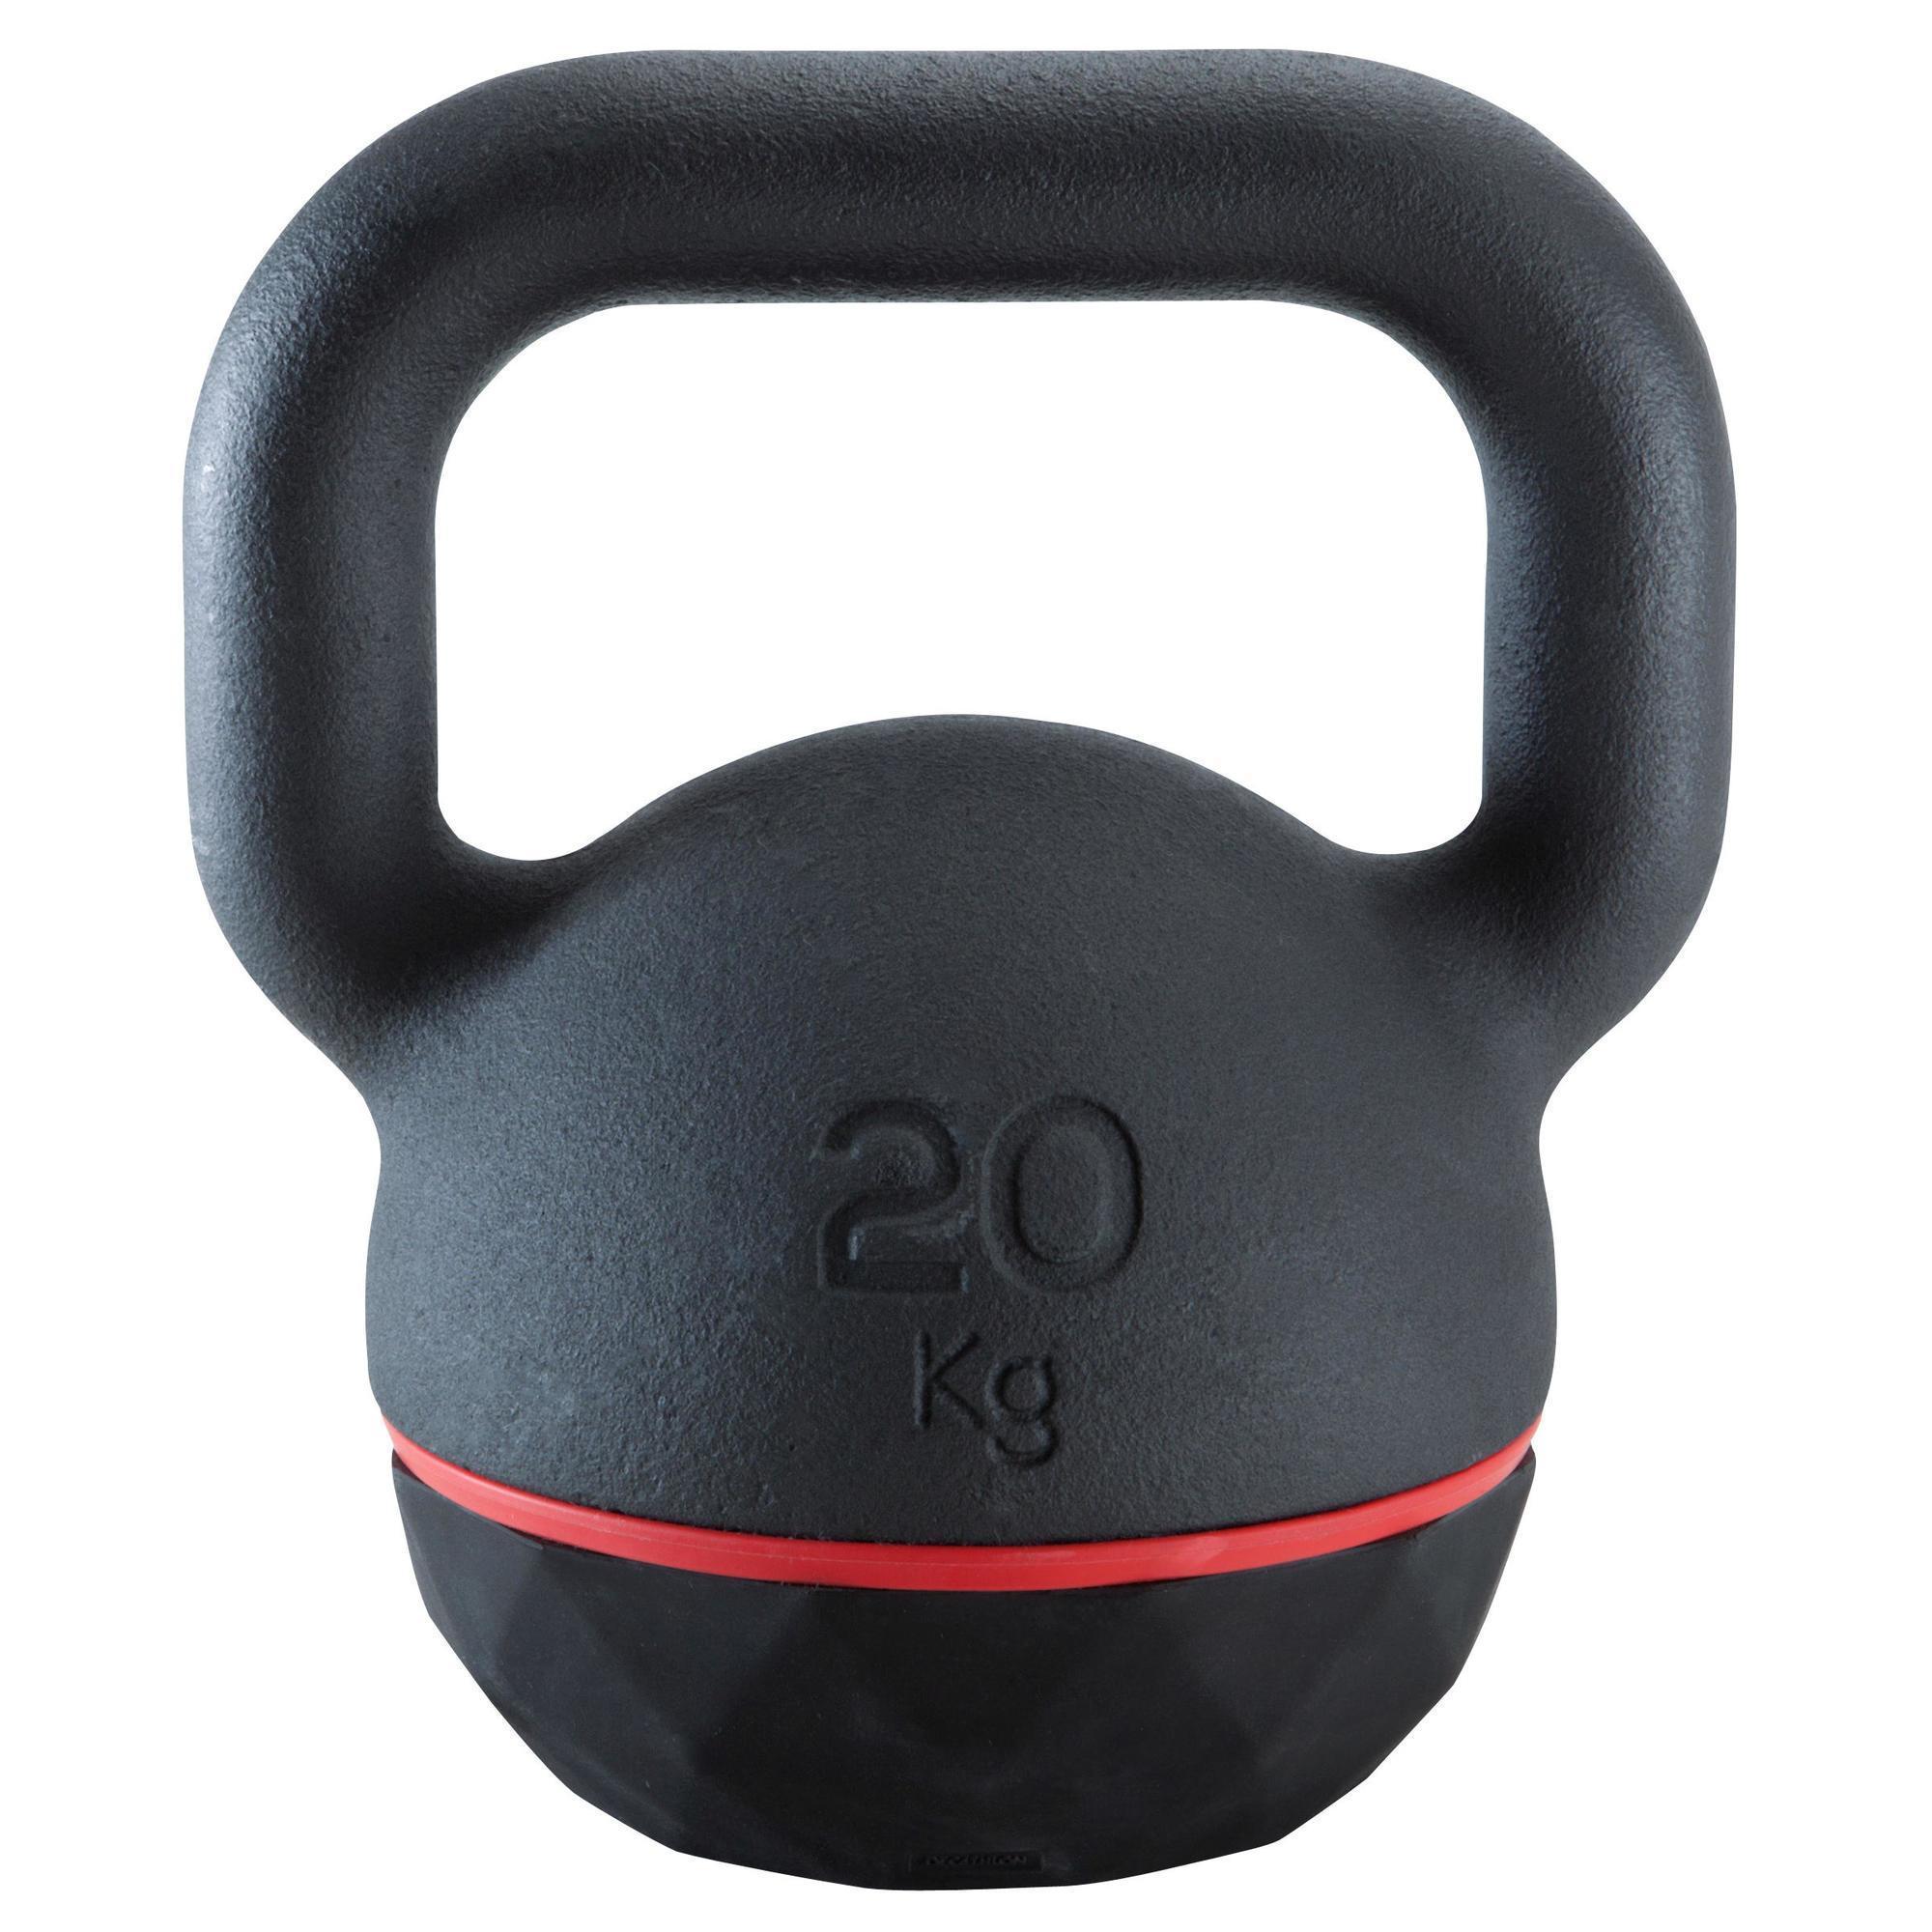 Kettlebell Pesa Rusa 20kg. Domyos Cross Fitness Musculación